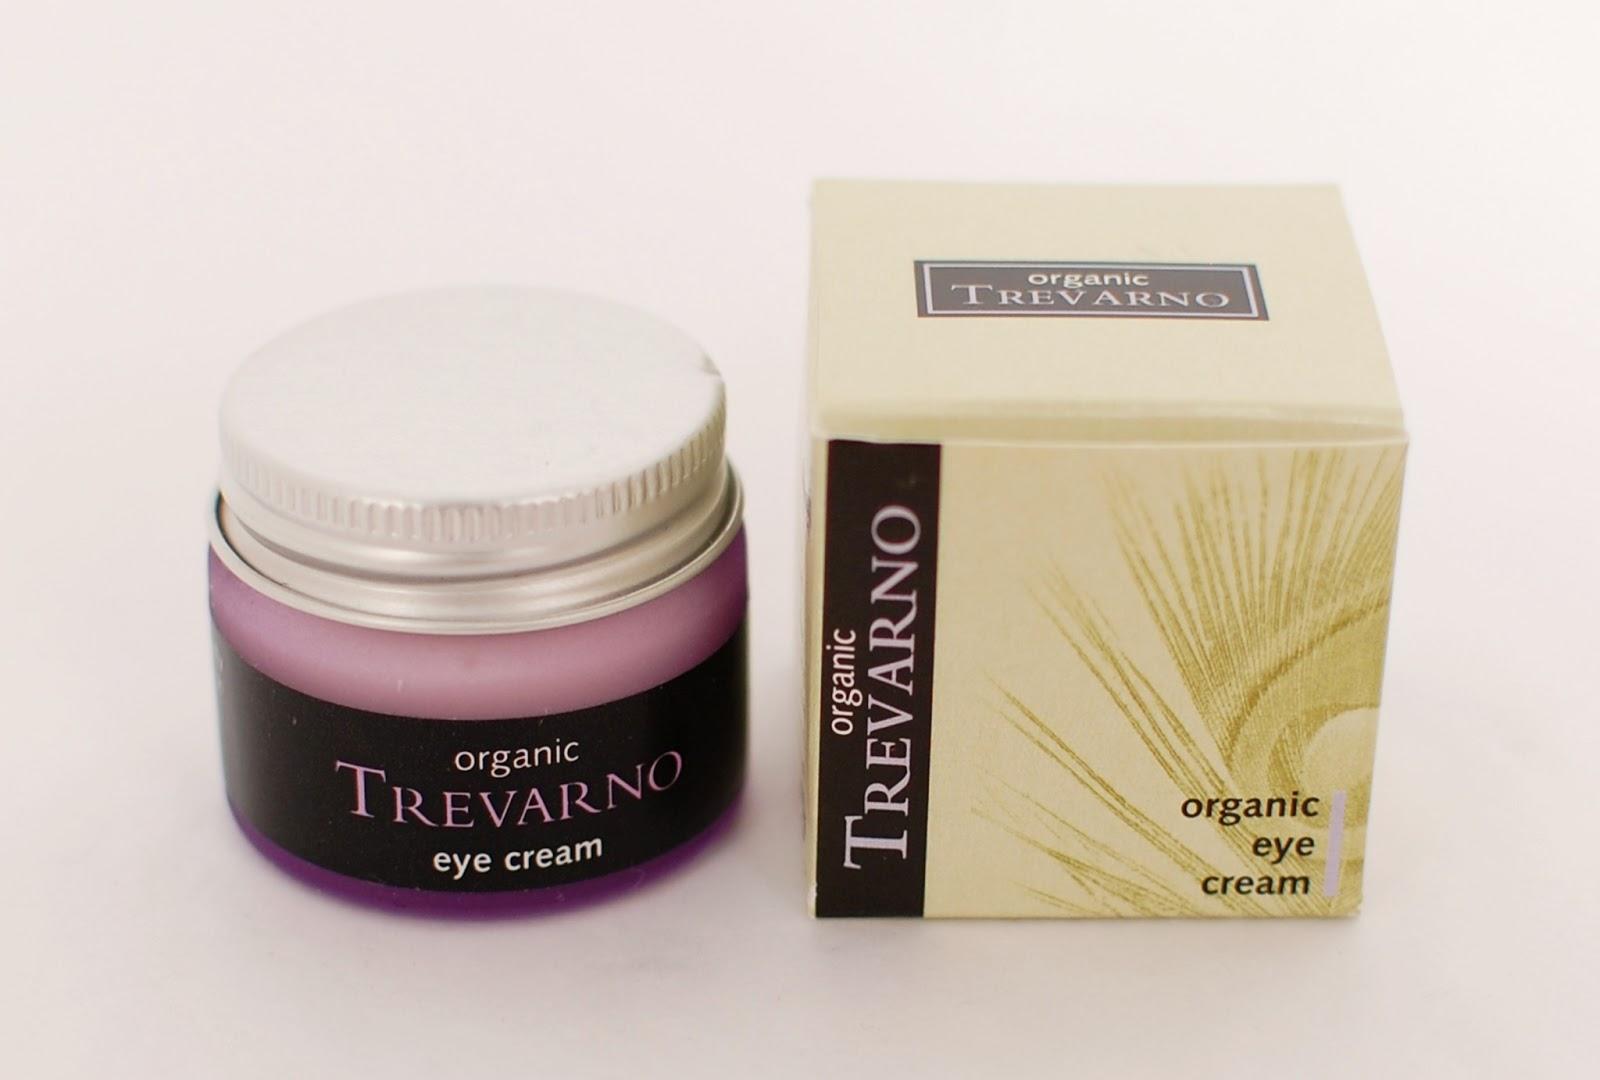 Trevarno Organic Eye Cream, Krema za okoli oči